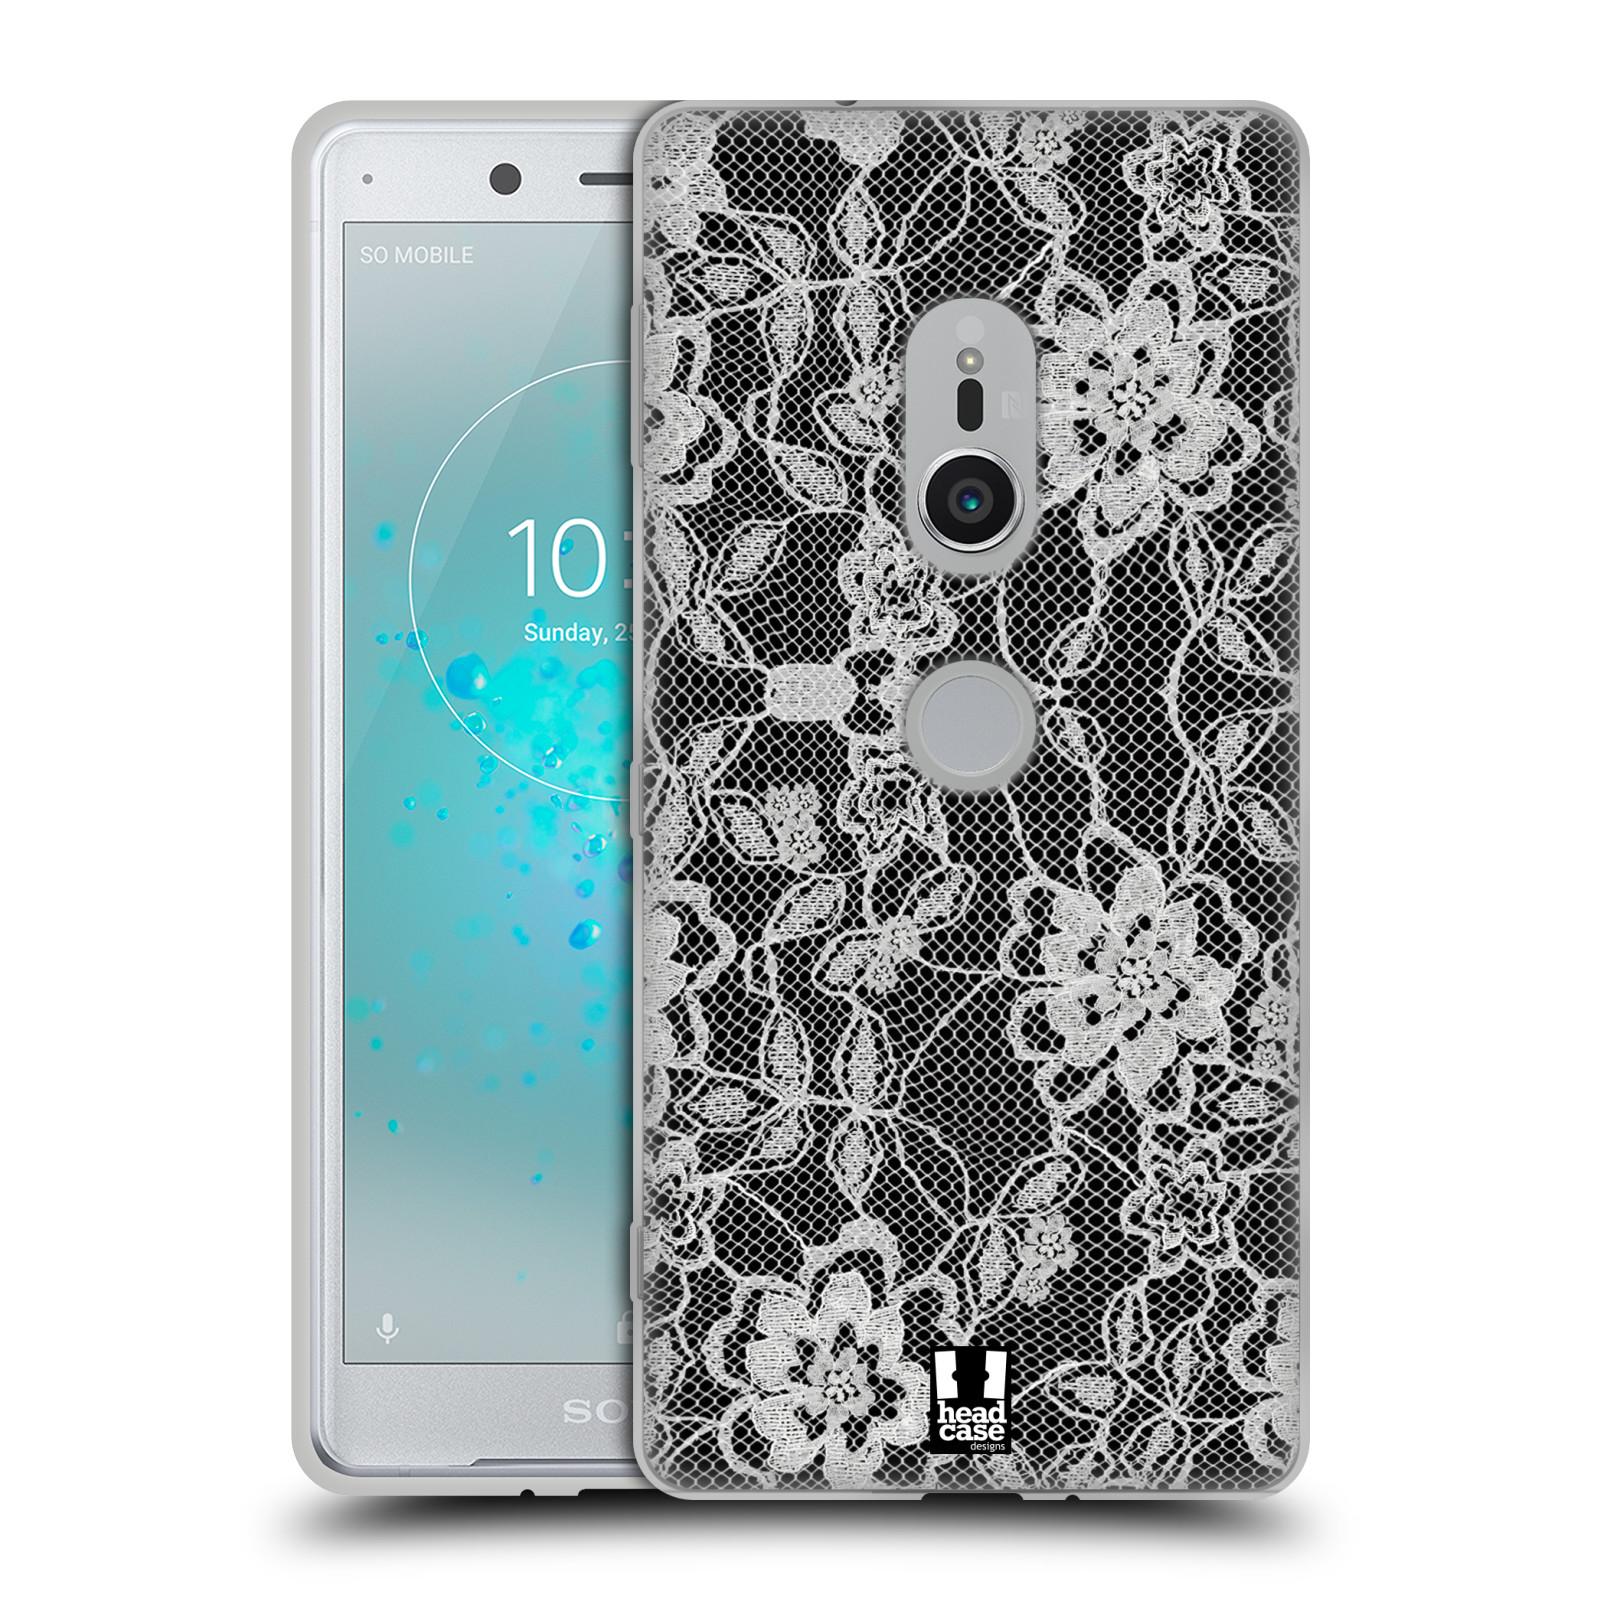 Silikonové pouzdro na mobil Sony Xperia XZ2 - Head Case - FLOWERY KRAJKA